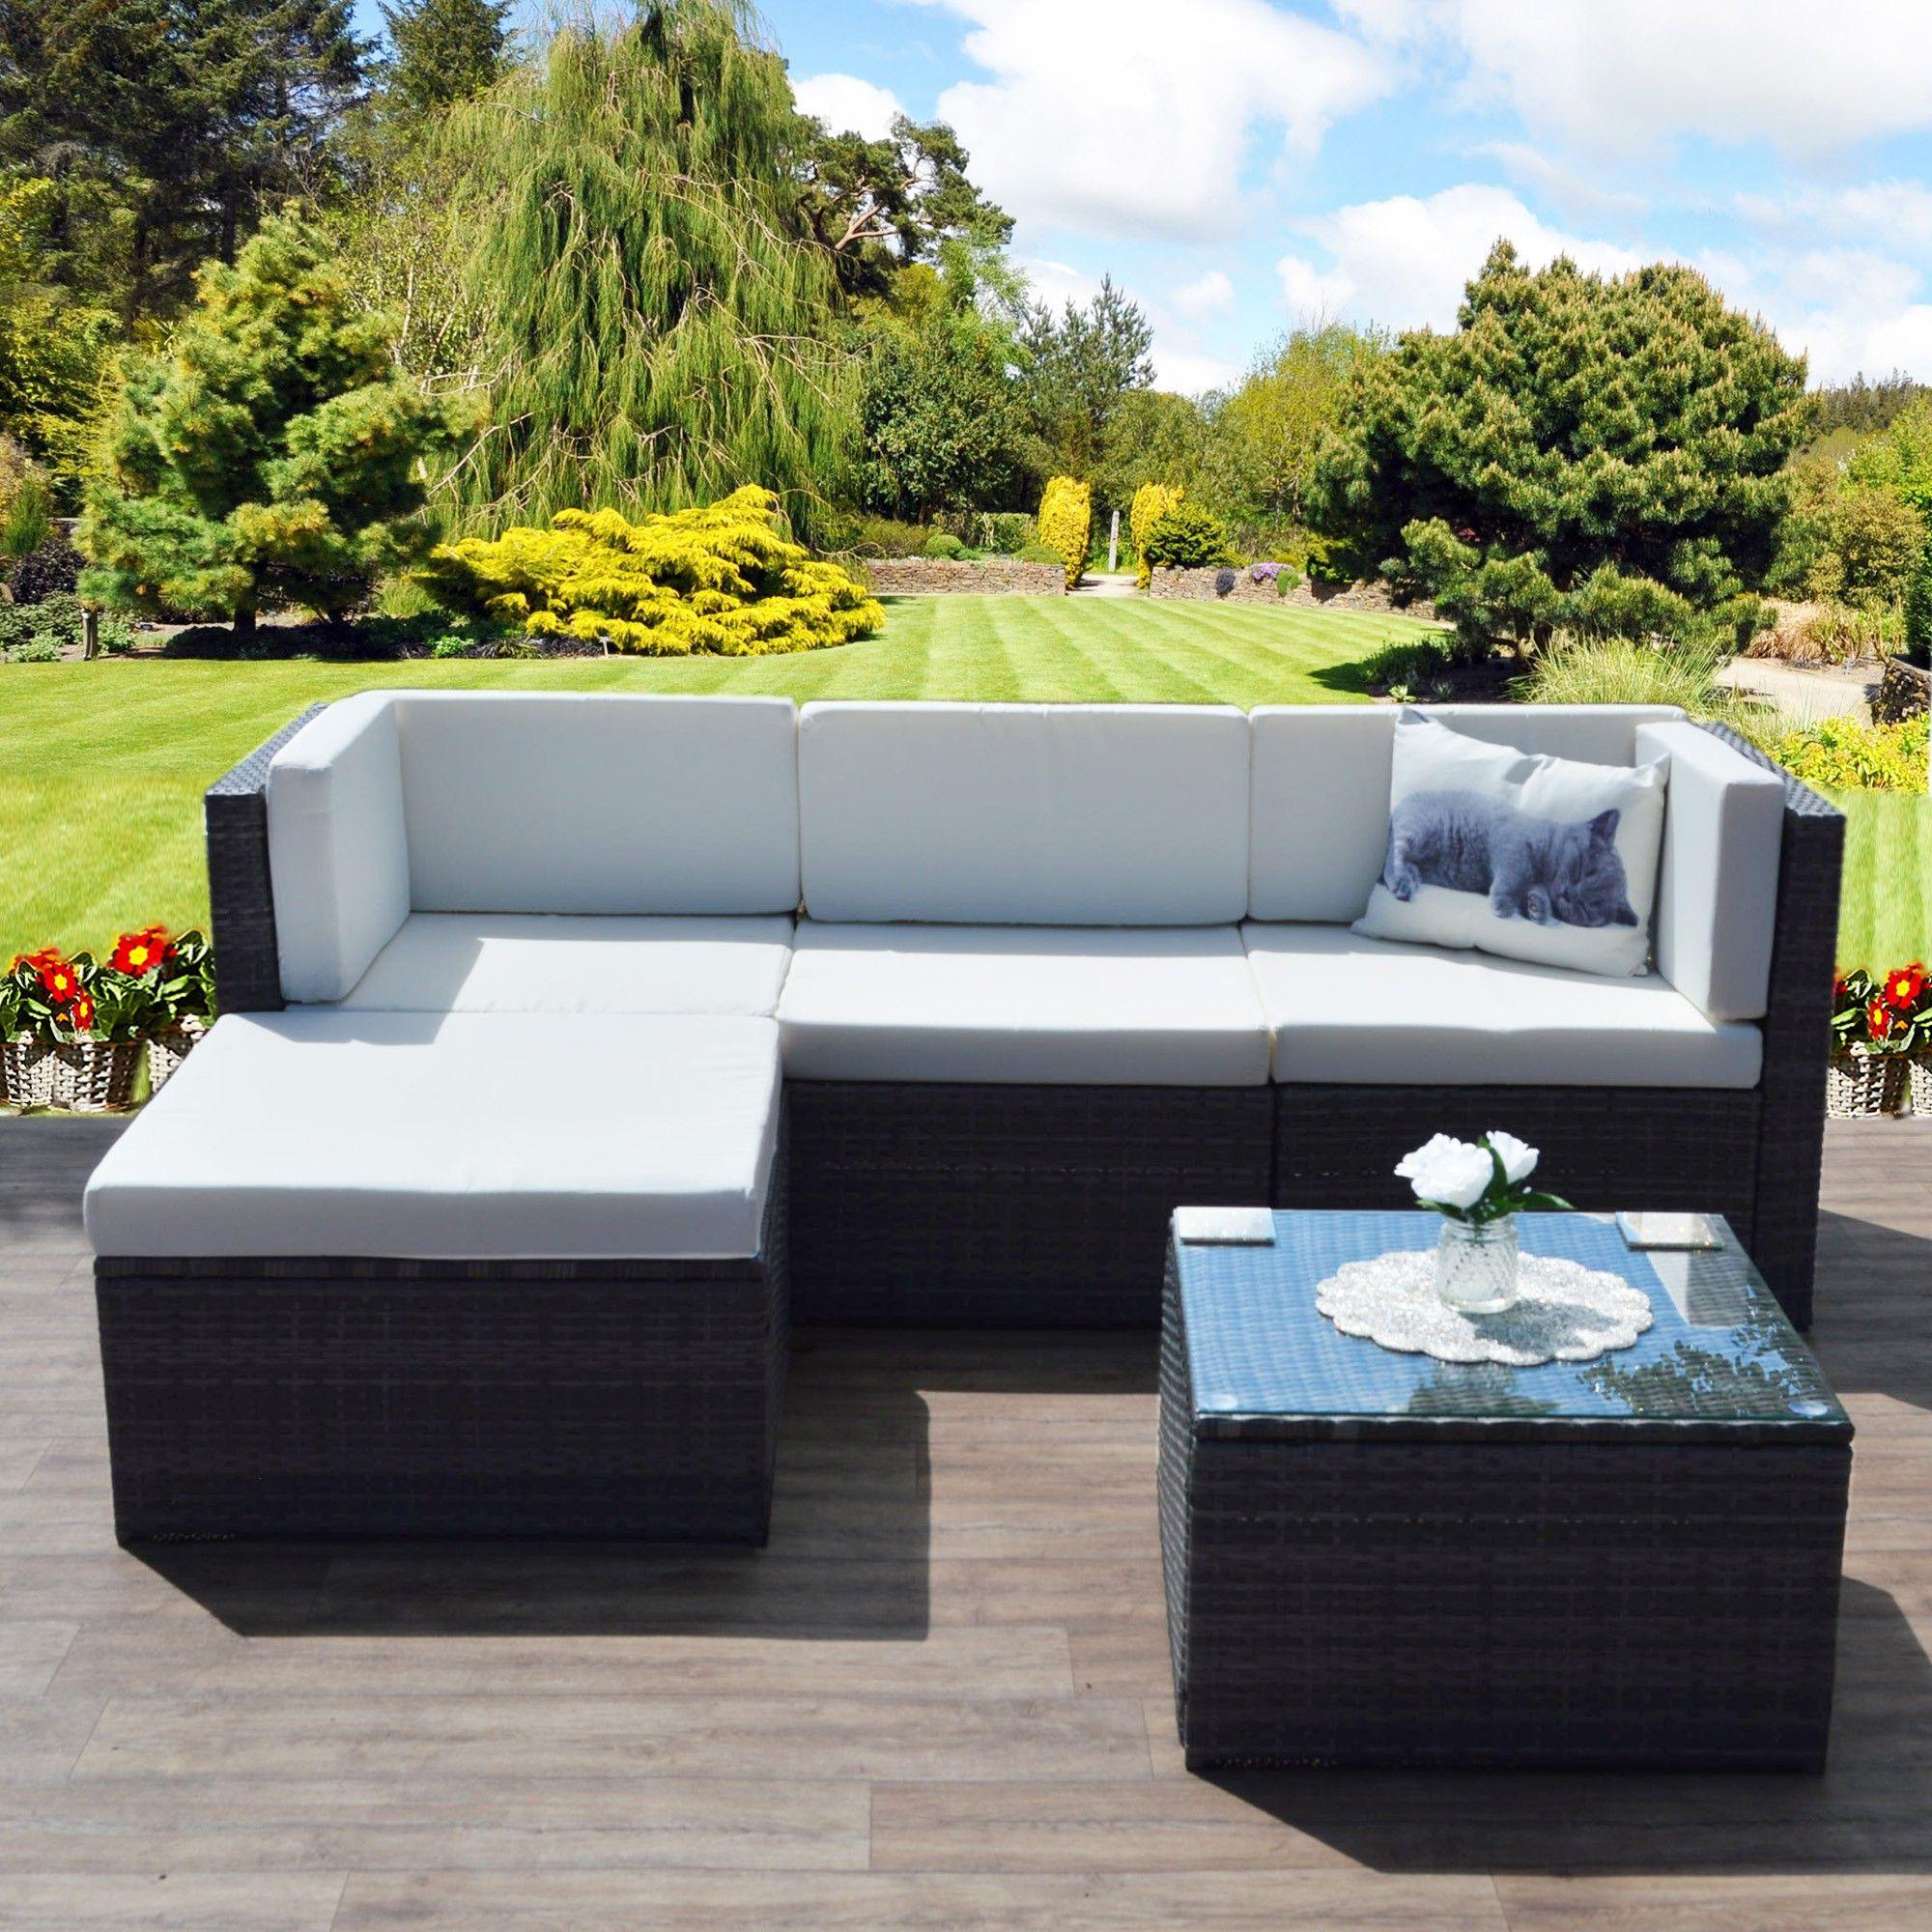 6pc Milan Modular Rattan Corner Sofa Set Bed For Baby Lazada 5 Piece Www Redglobalmx Org Faro In Dark Mixed Grey With